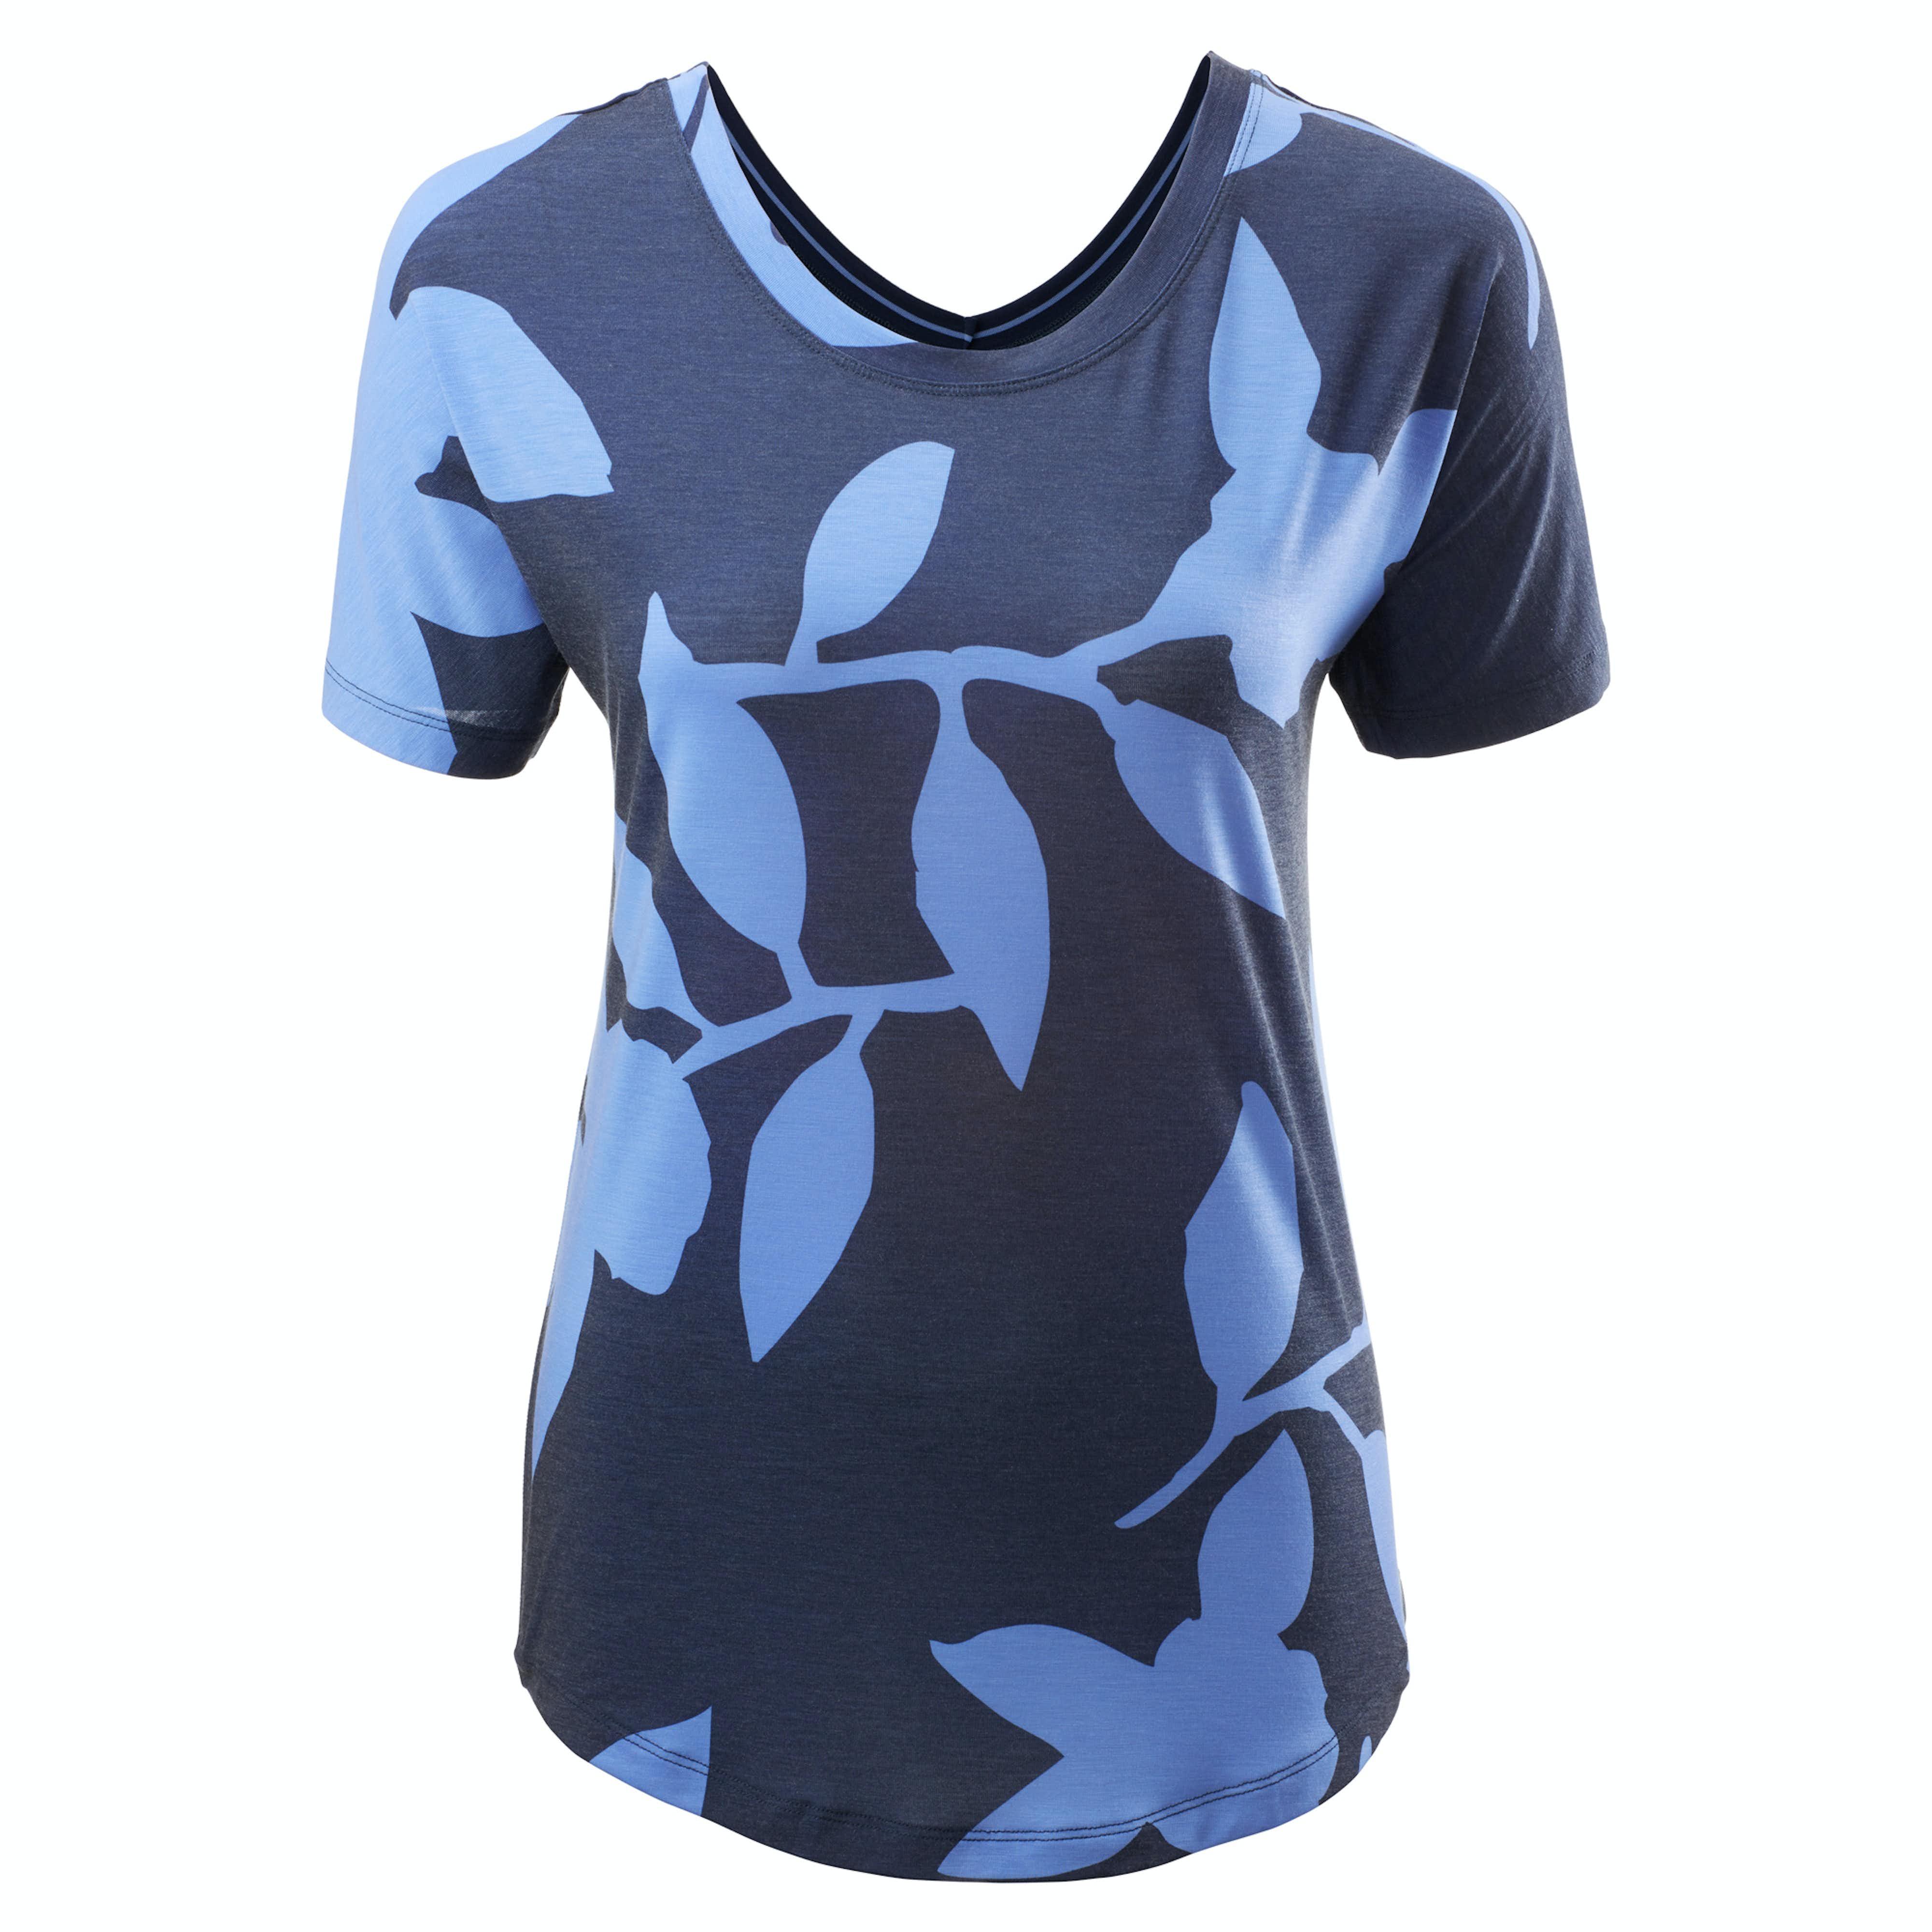 f5121311da51 Adapt Women s Reversible T-shirt - Black Pinstripe